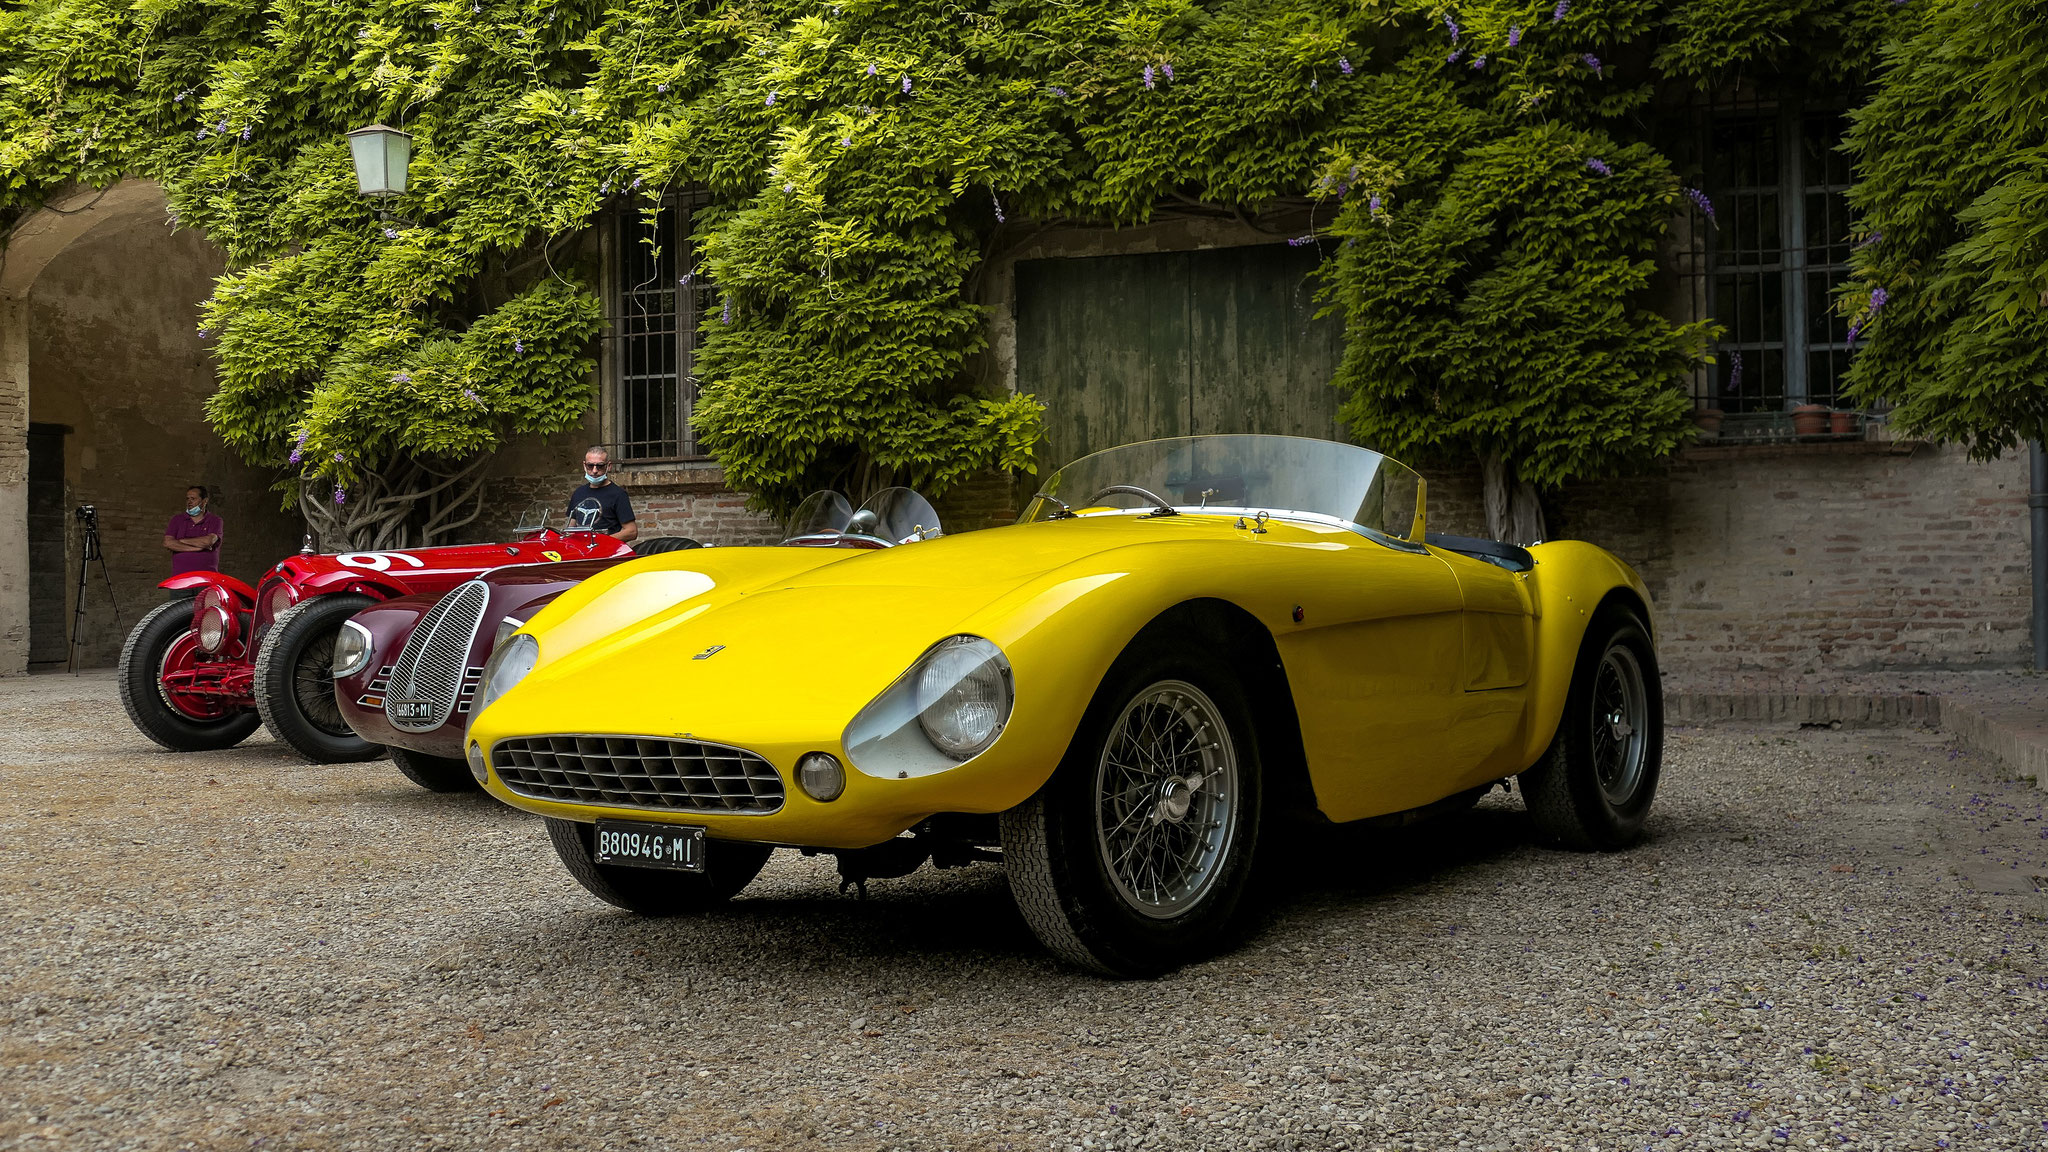 Ferrari 500 Mondial PF Spyder - 880946-MI (ITA)